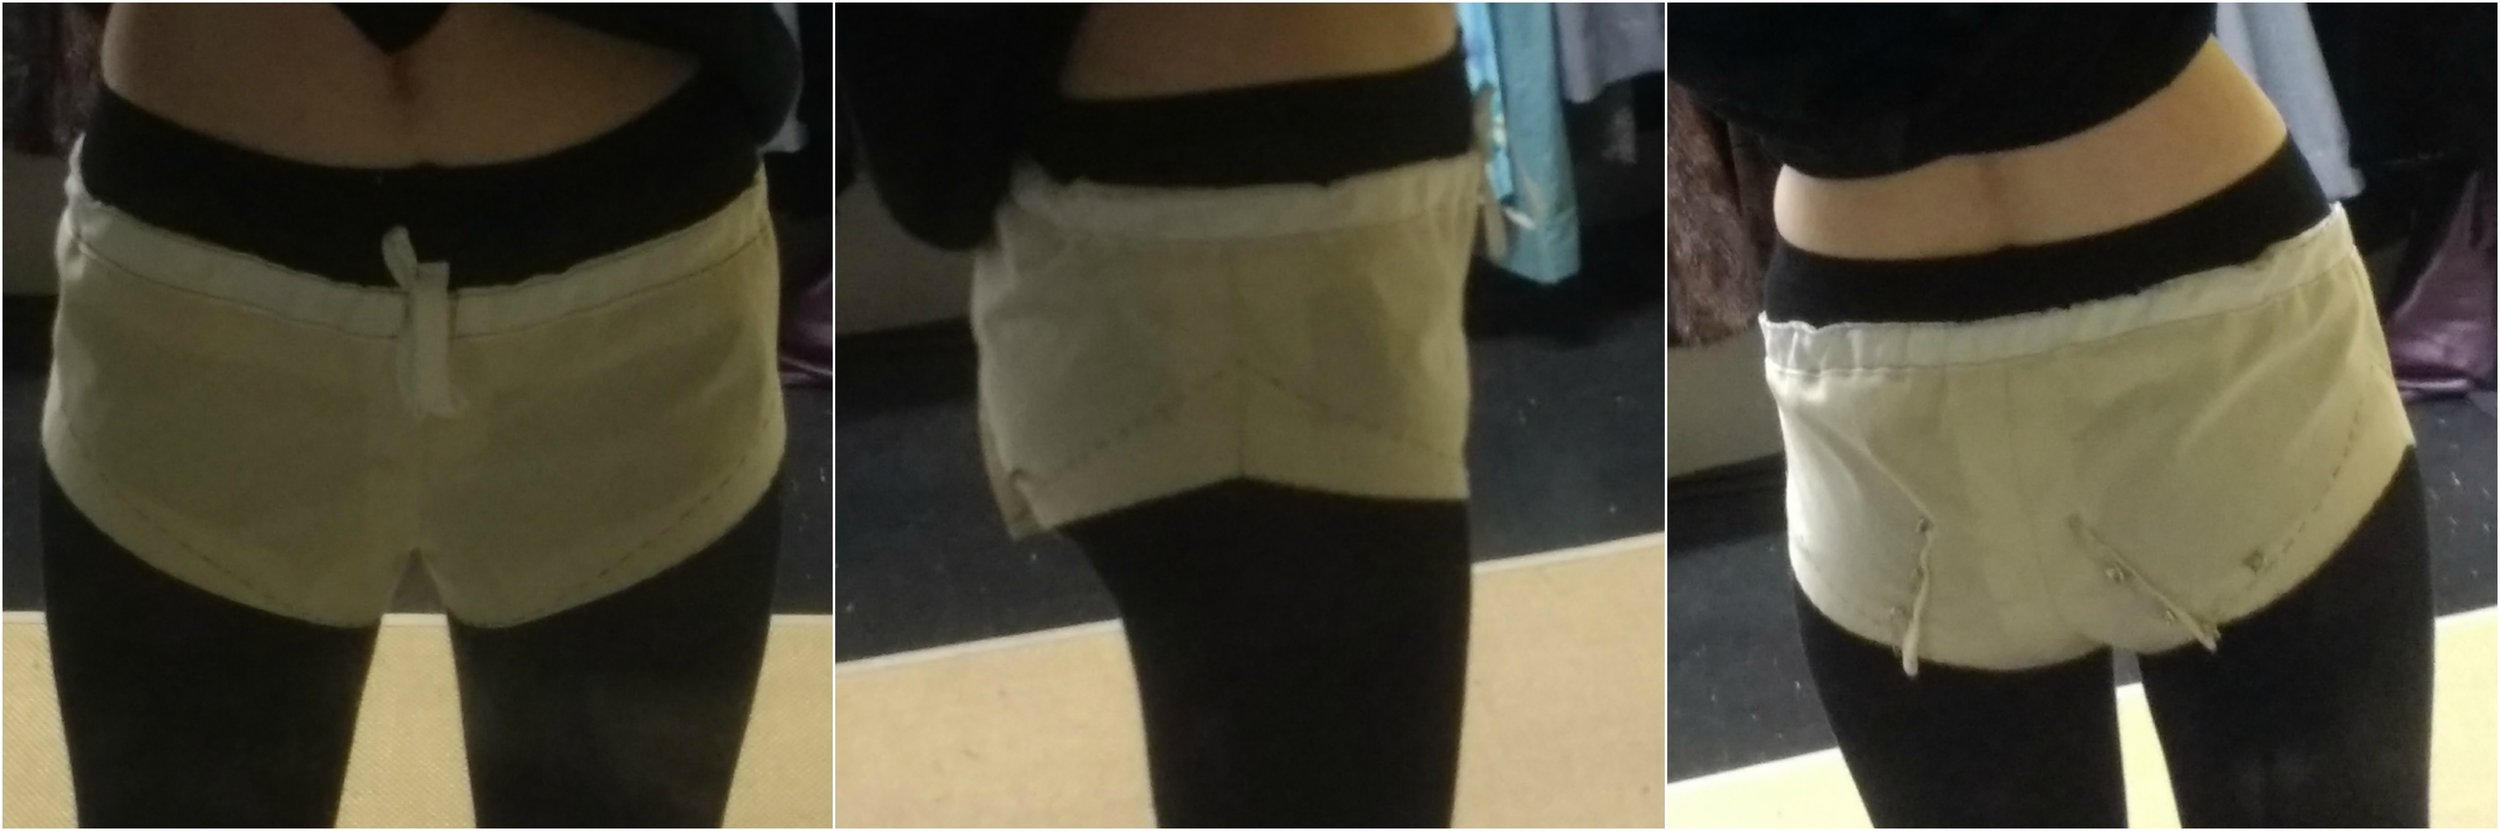 shorts first fitting.jpg